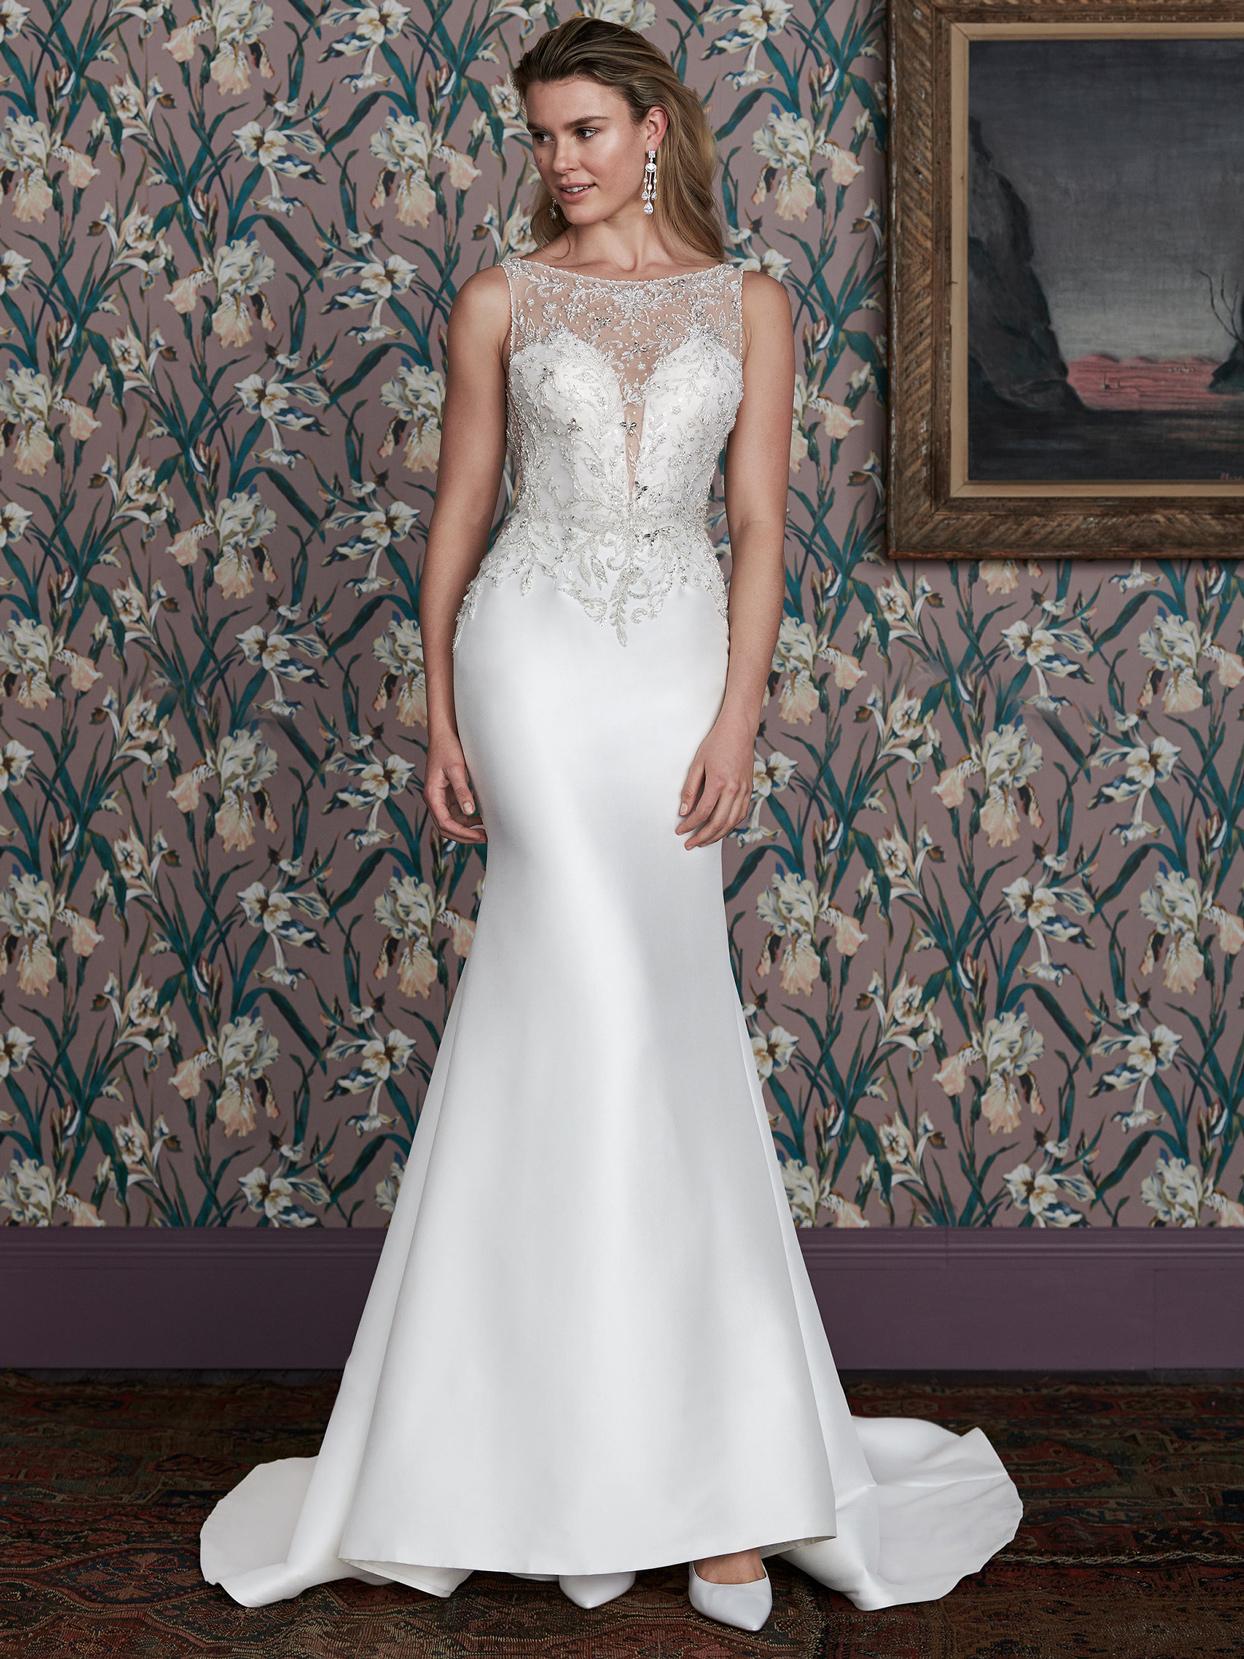 justin alexander illusion lace high neck plunging v-neck wedding dress spring 2021